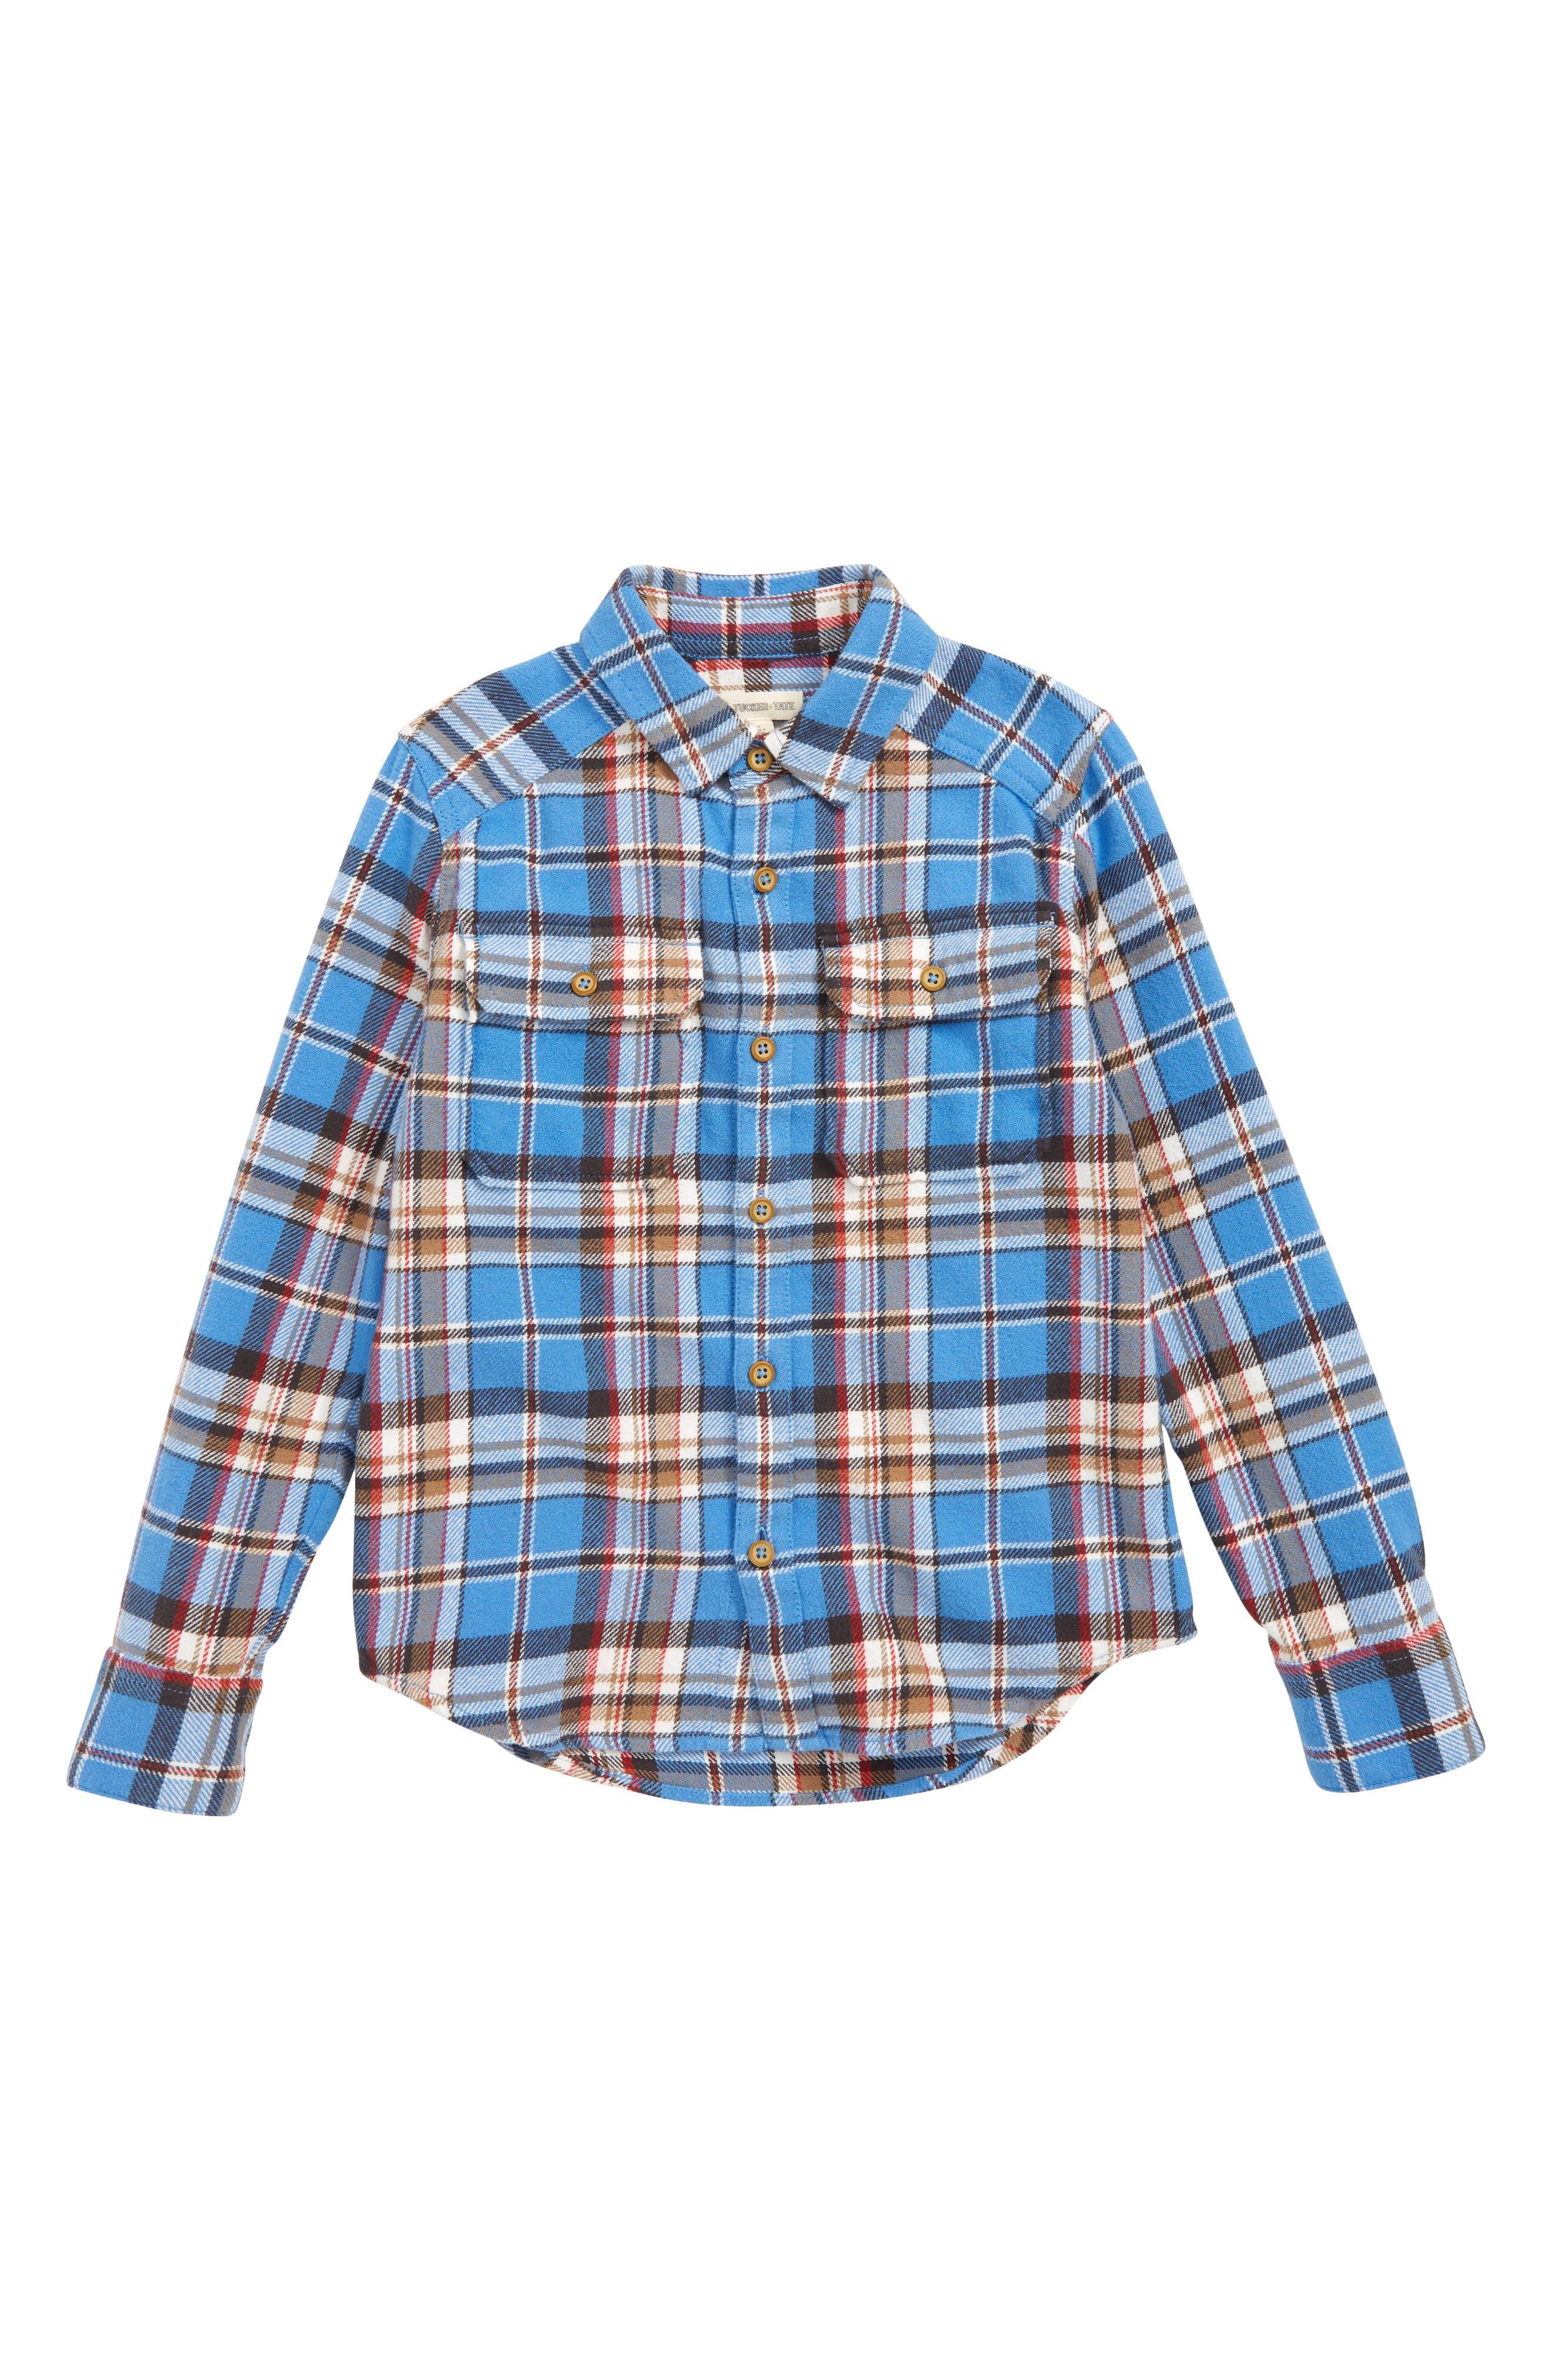 TUCKER + TATE, Plaid Flannel Shirt, Main thumbnail 1, color, BLUE LAPIS BILLY PLAID